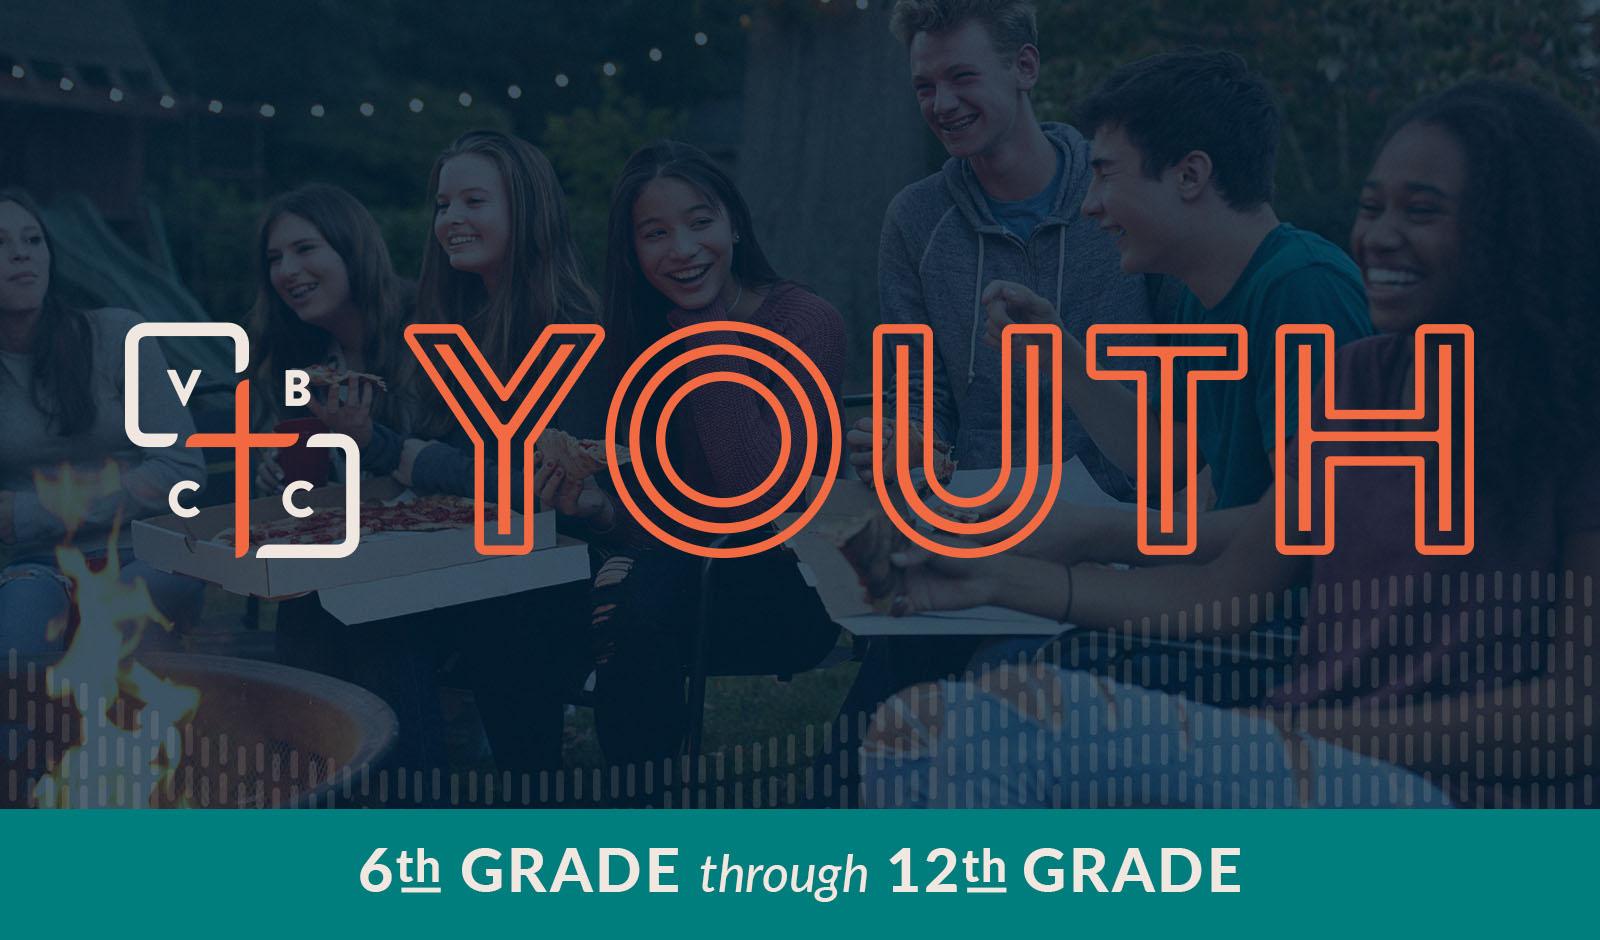 youth-website.jpg